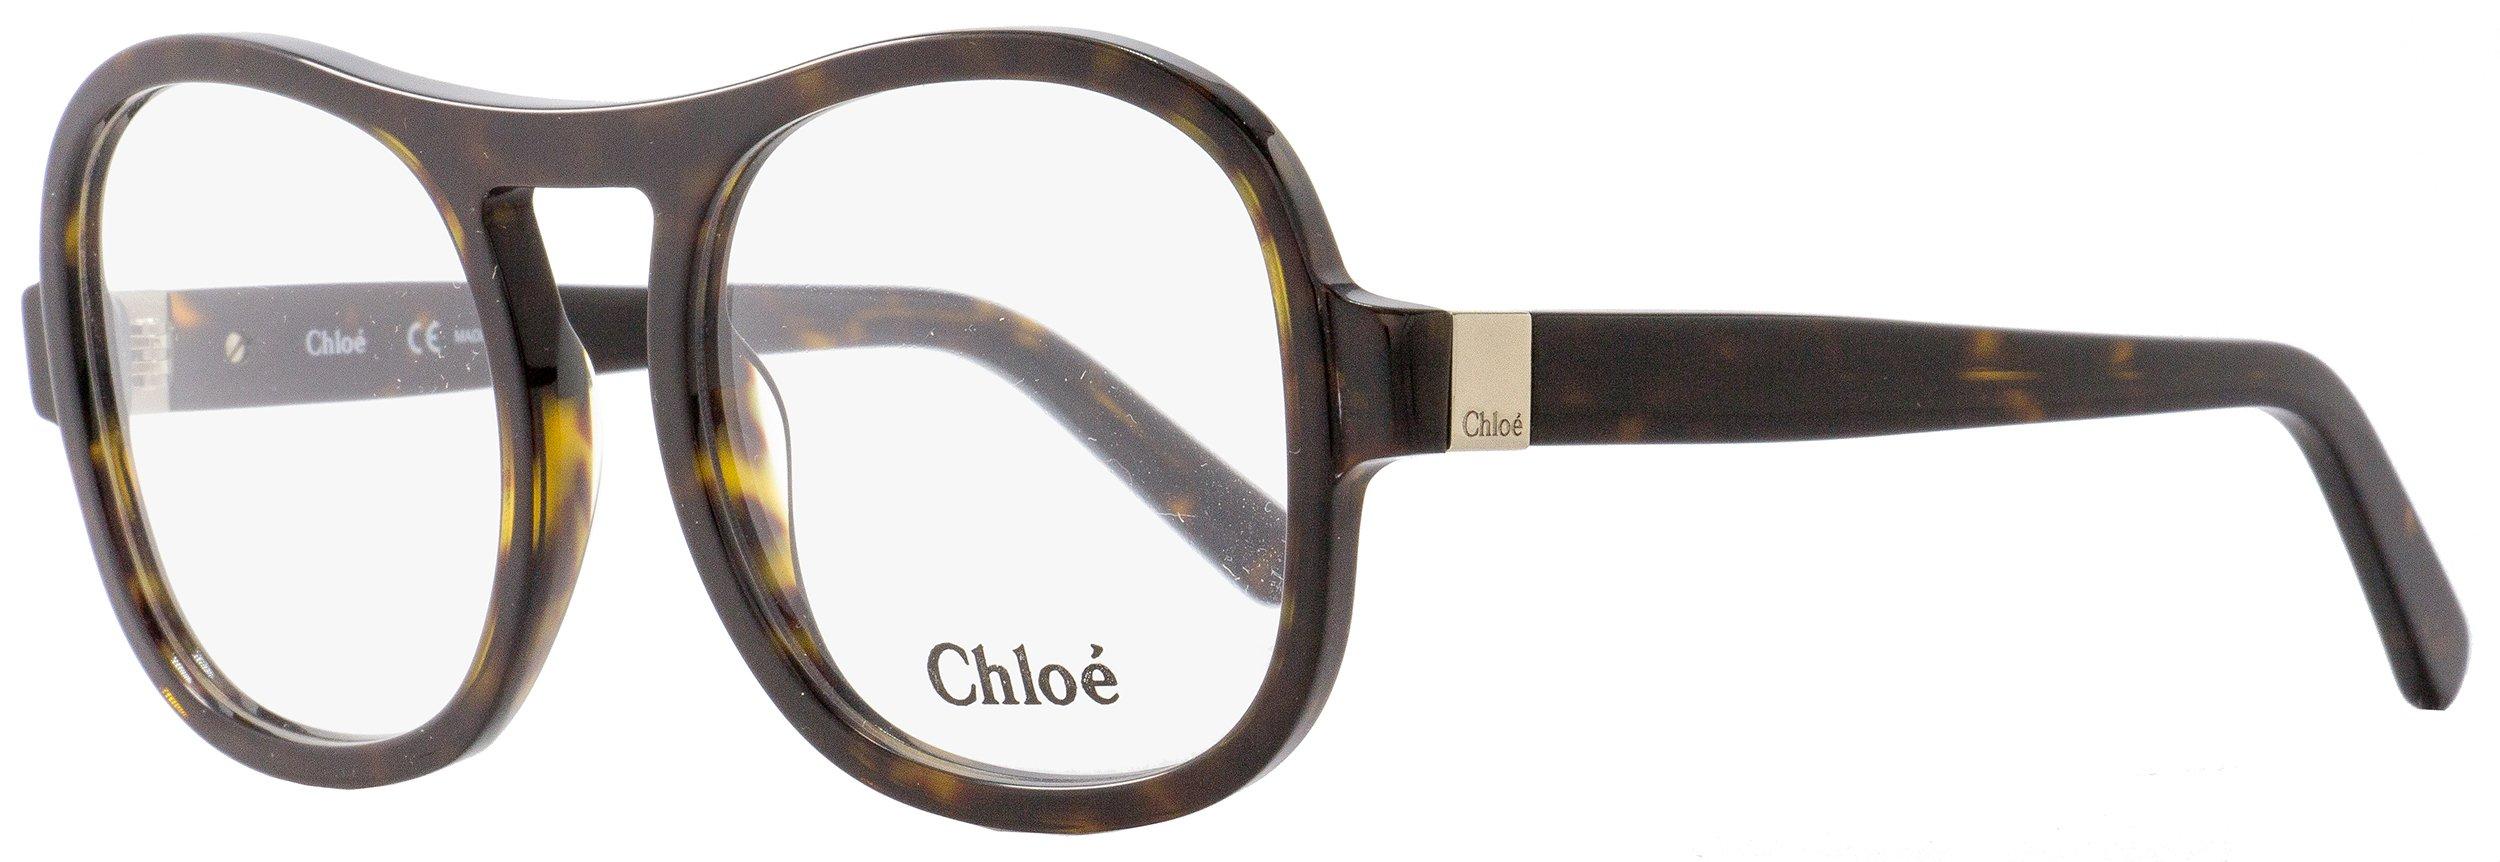 Chloe CE2698 219 Tortoise Rectangle Sunglasses by Chloe